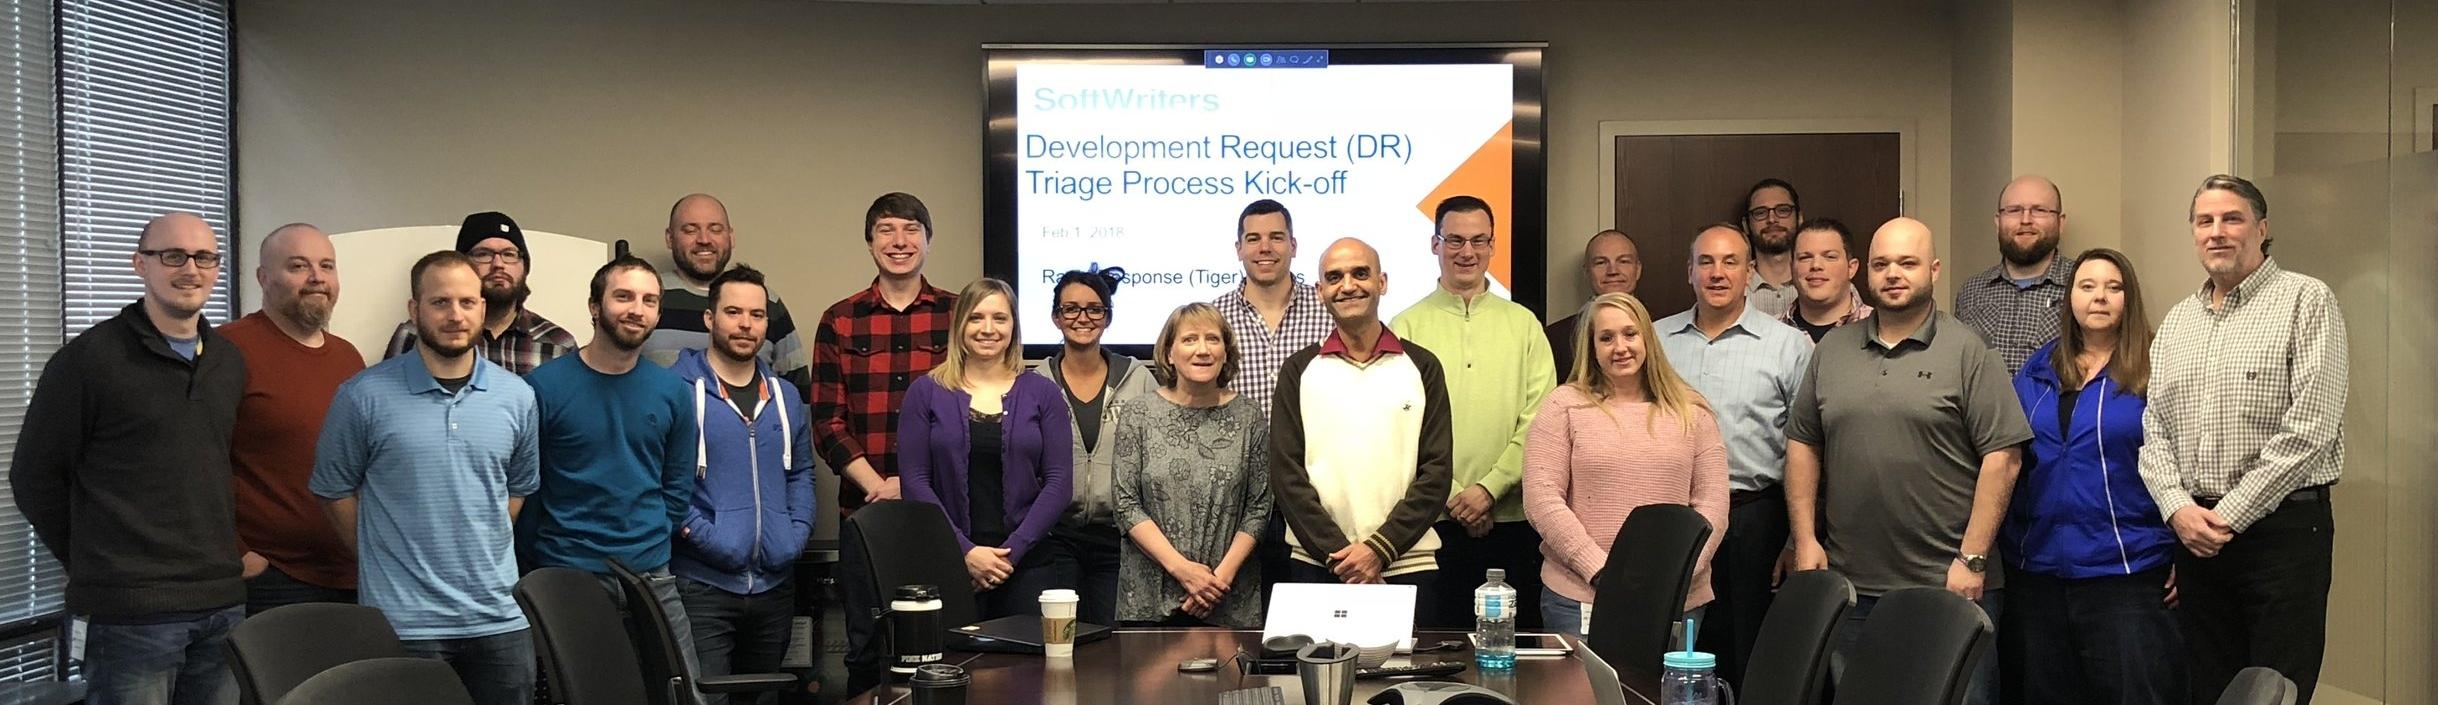 DR Triage Process KickOff-Team Photo.jpg